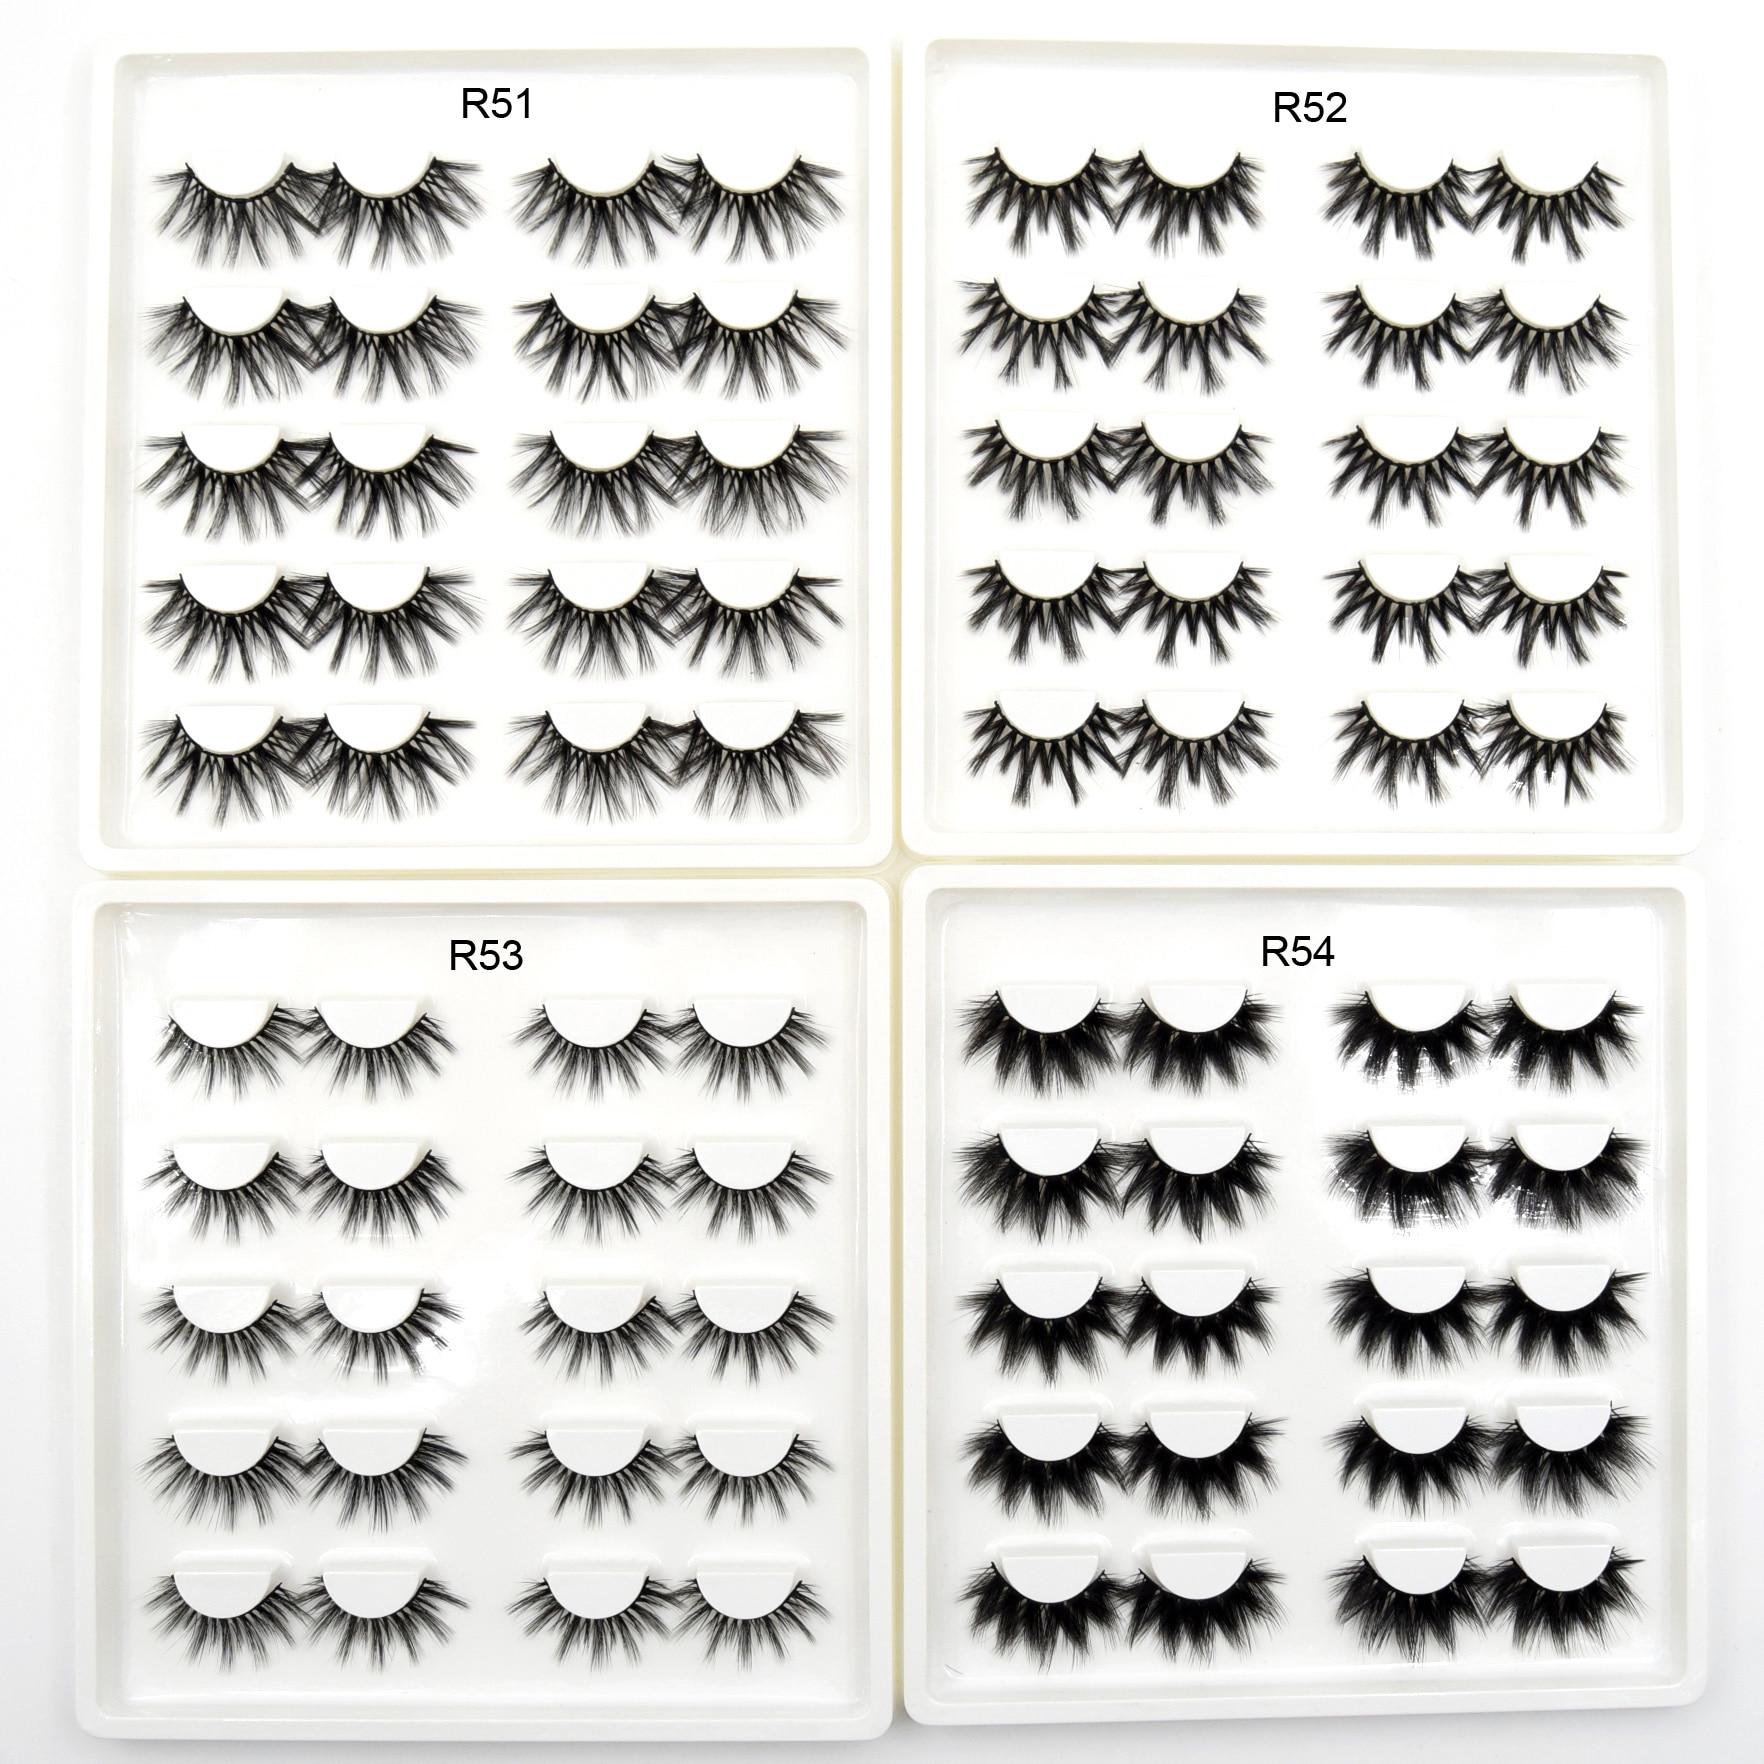 10 Pairs Faux Mink Eyelashes Handmade 3D False Eyelashes Full Strip Lashes Crisscross Thick Natural Long Eye Lashes Makeup Lash